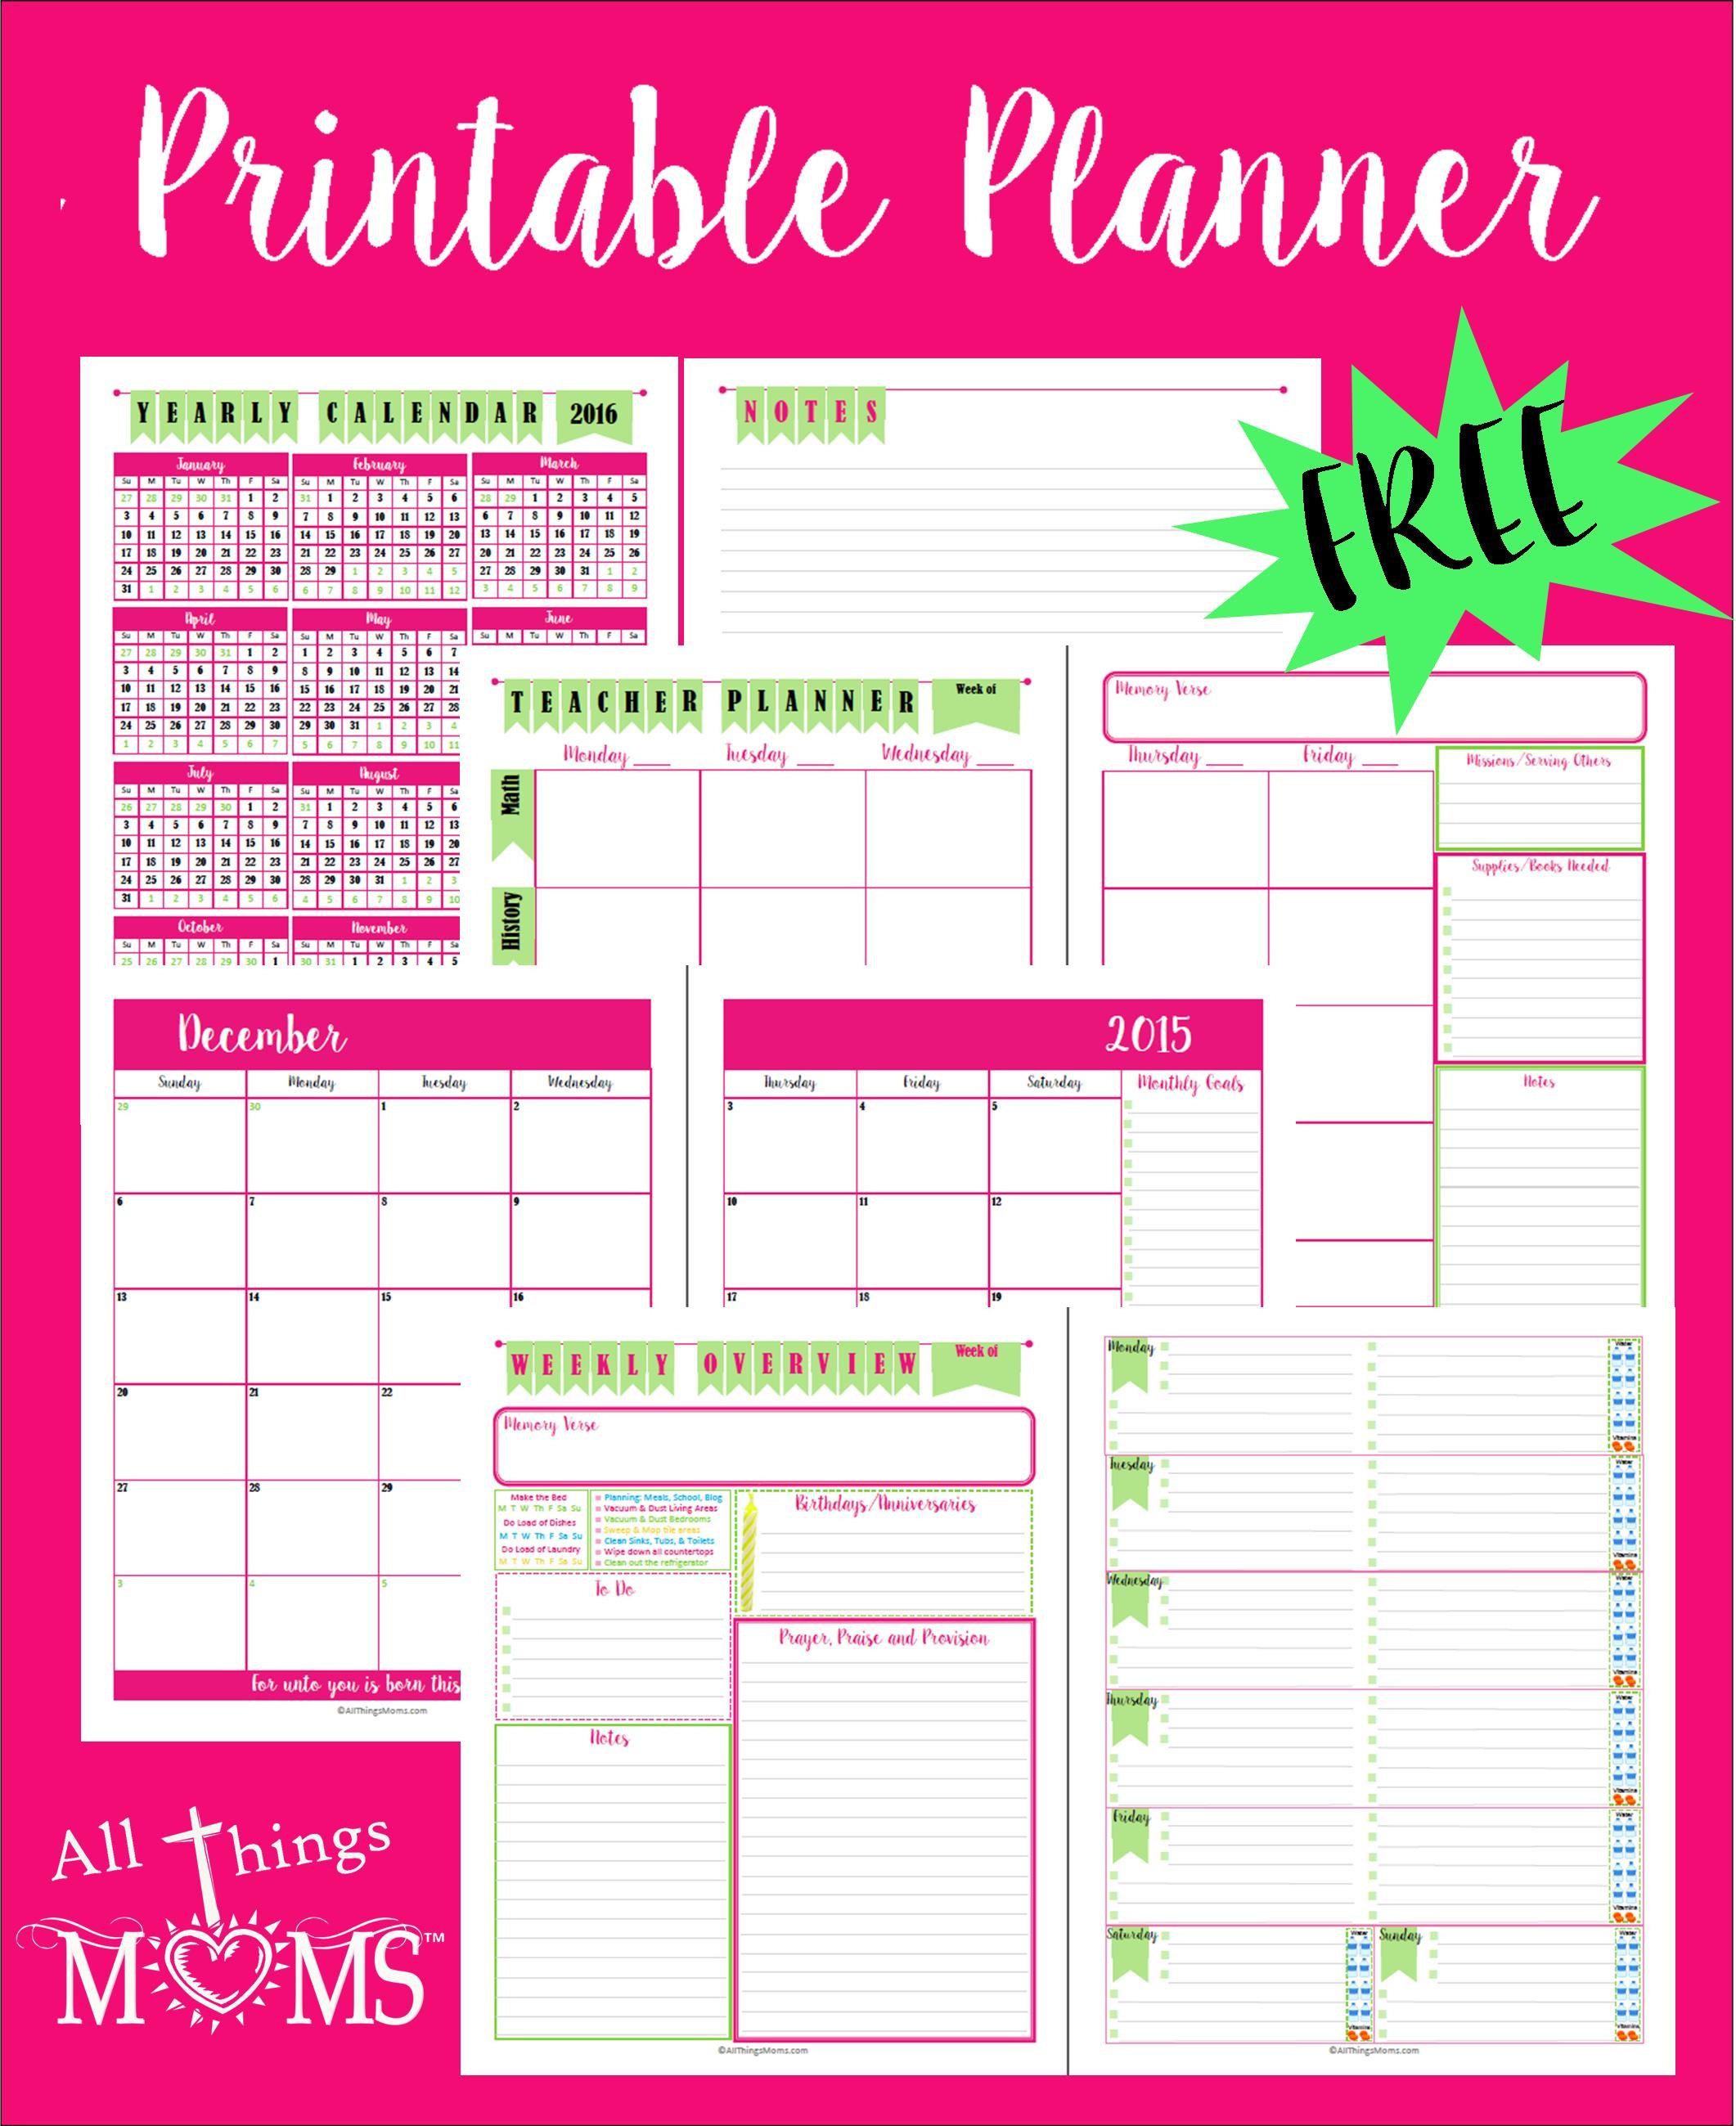 Printable Planner All Things Moms